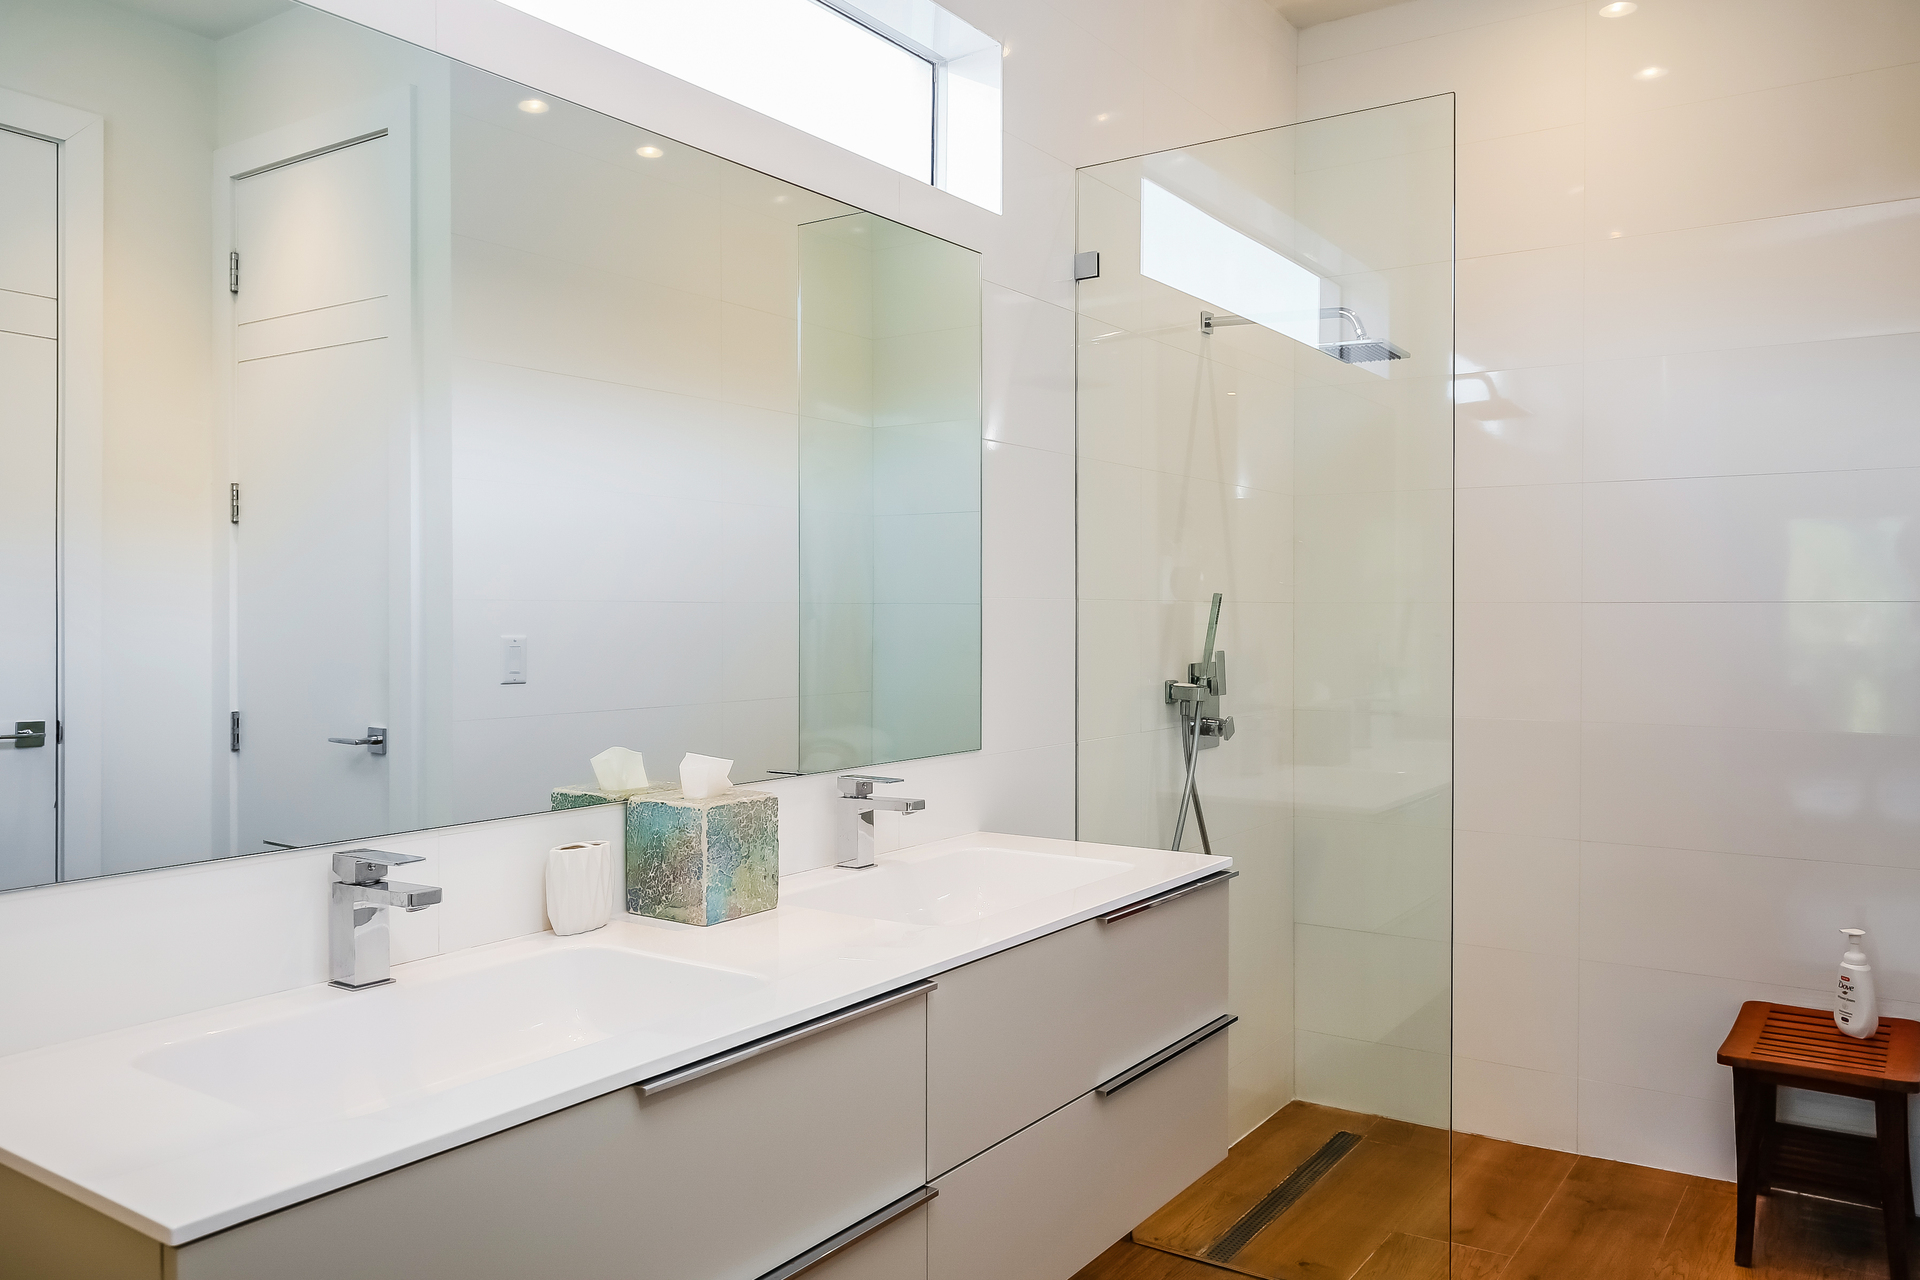 022-Master_Bathroom-5037892-medium